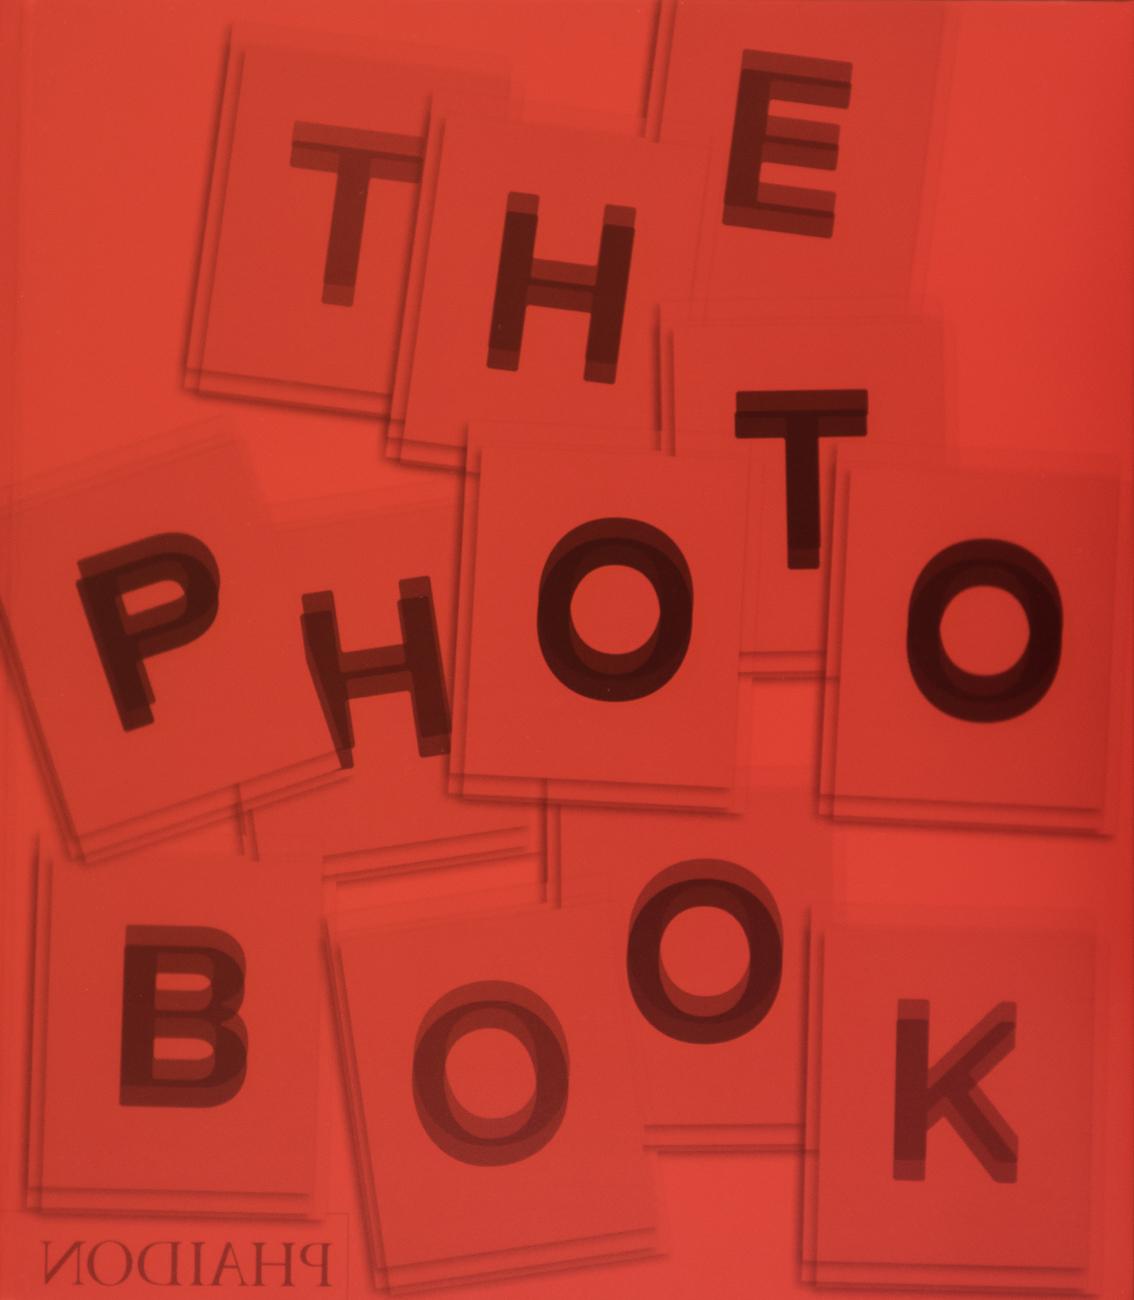 The Photo Book-Phaidon.jpg - fotógrafos - Vision Natural, Badillo Koldo argazkiak